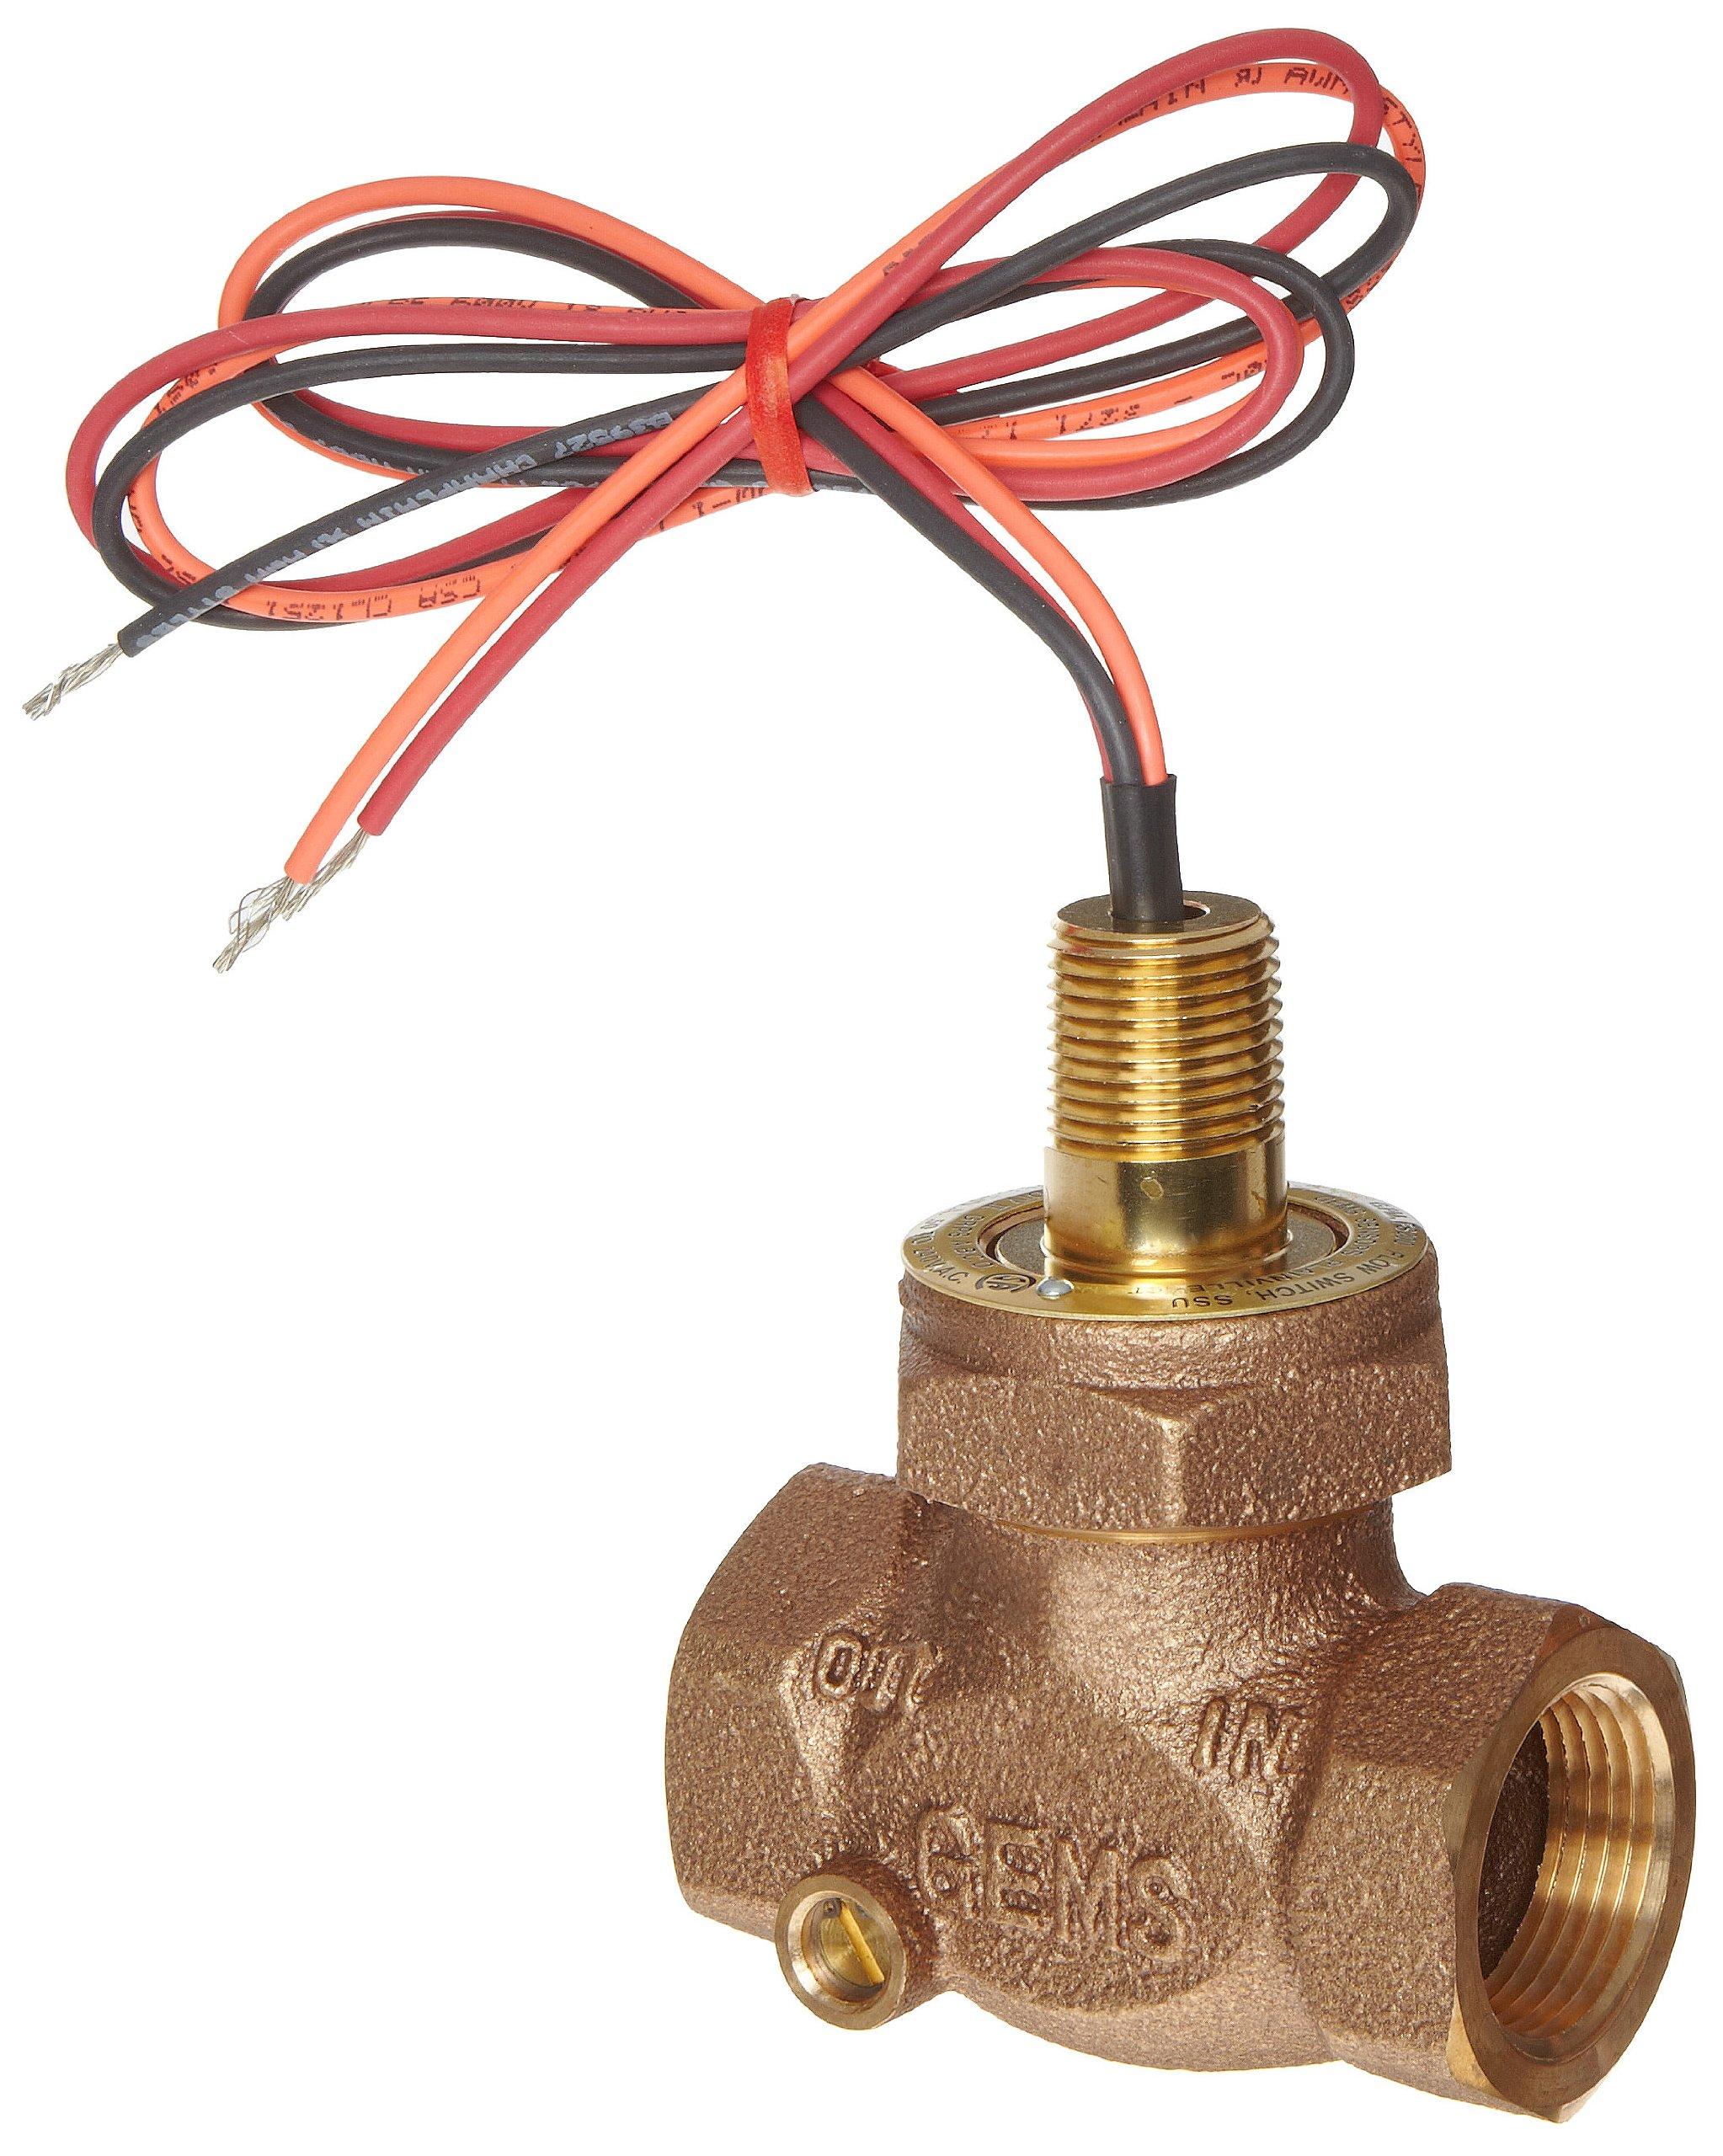 Gems Sensors FS-200 Adjustable Series Bronze Flow Switch, Inline, Shuttle Type, 1.0 - 6.0 gpm Flow Setting Adjustment Range, 1'' NPT Female